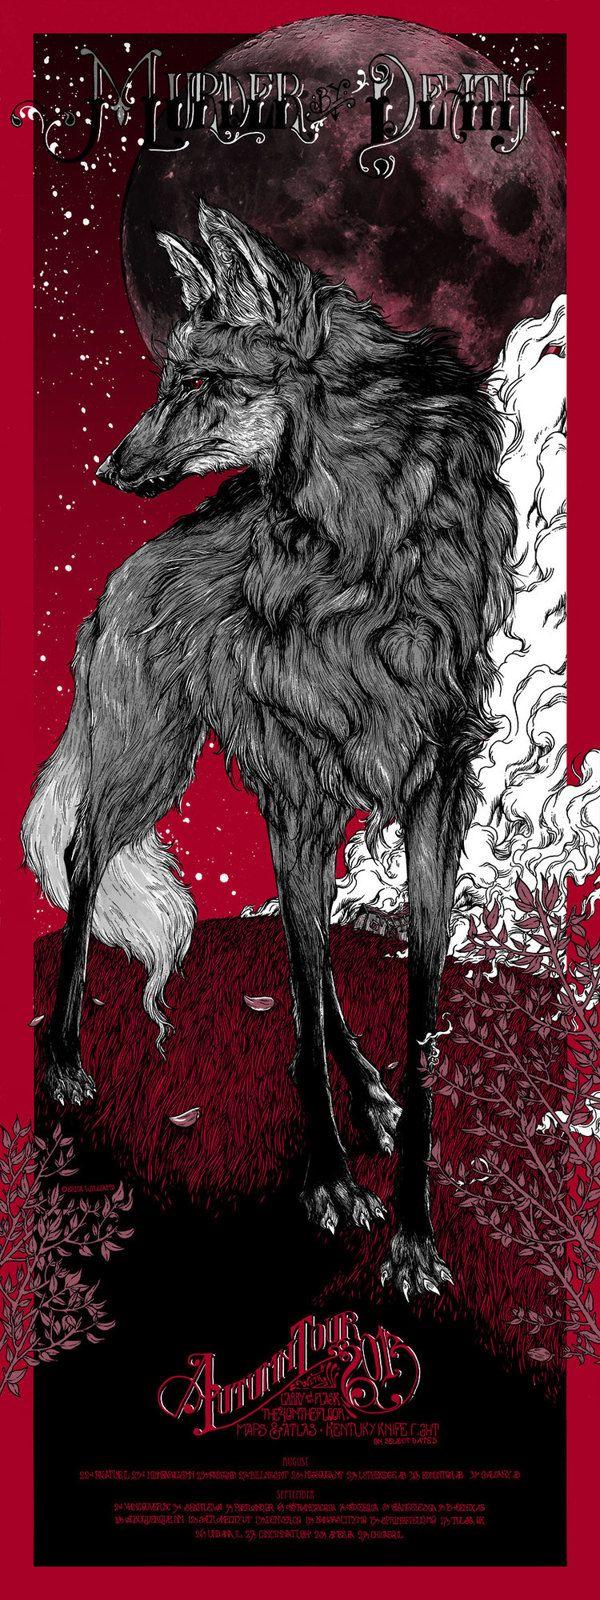 Murder By Death Autumn Tour by Erica Williams, via Behance